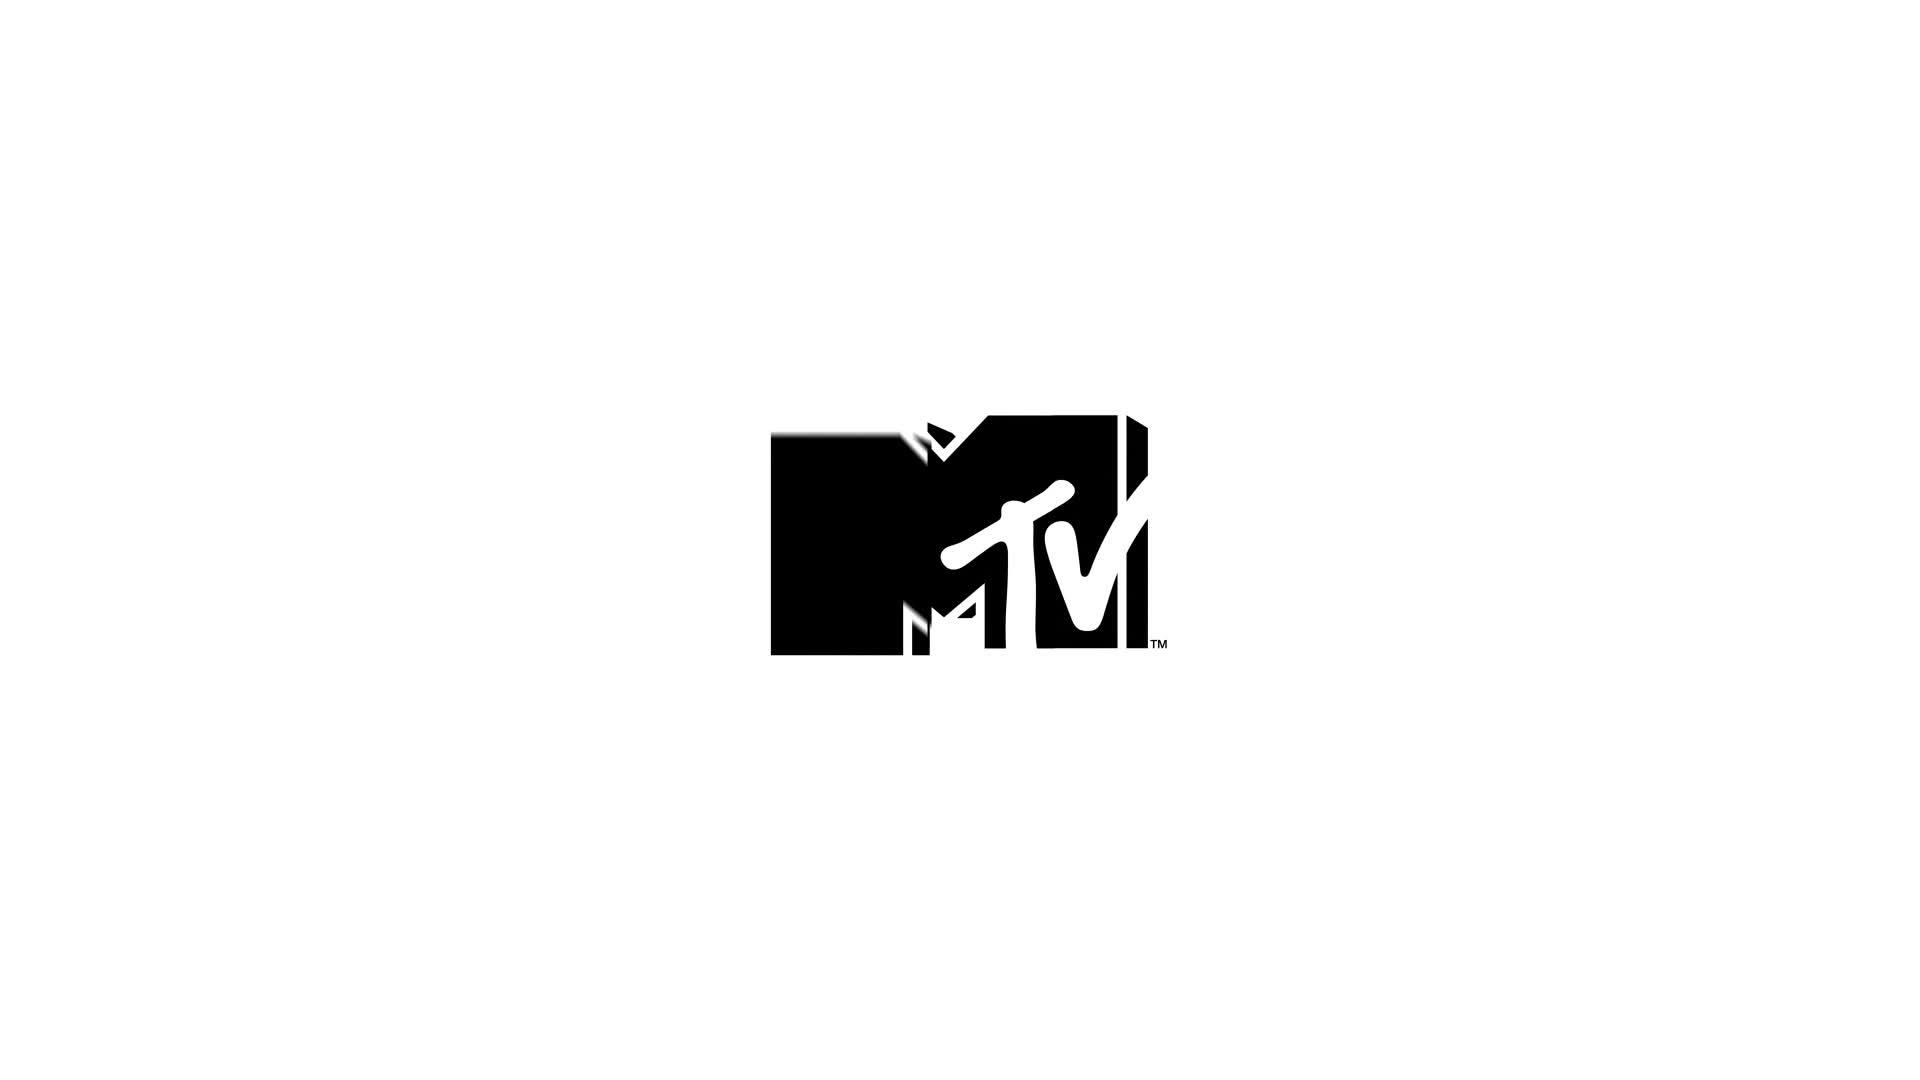 Honoree - MTV Instamission